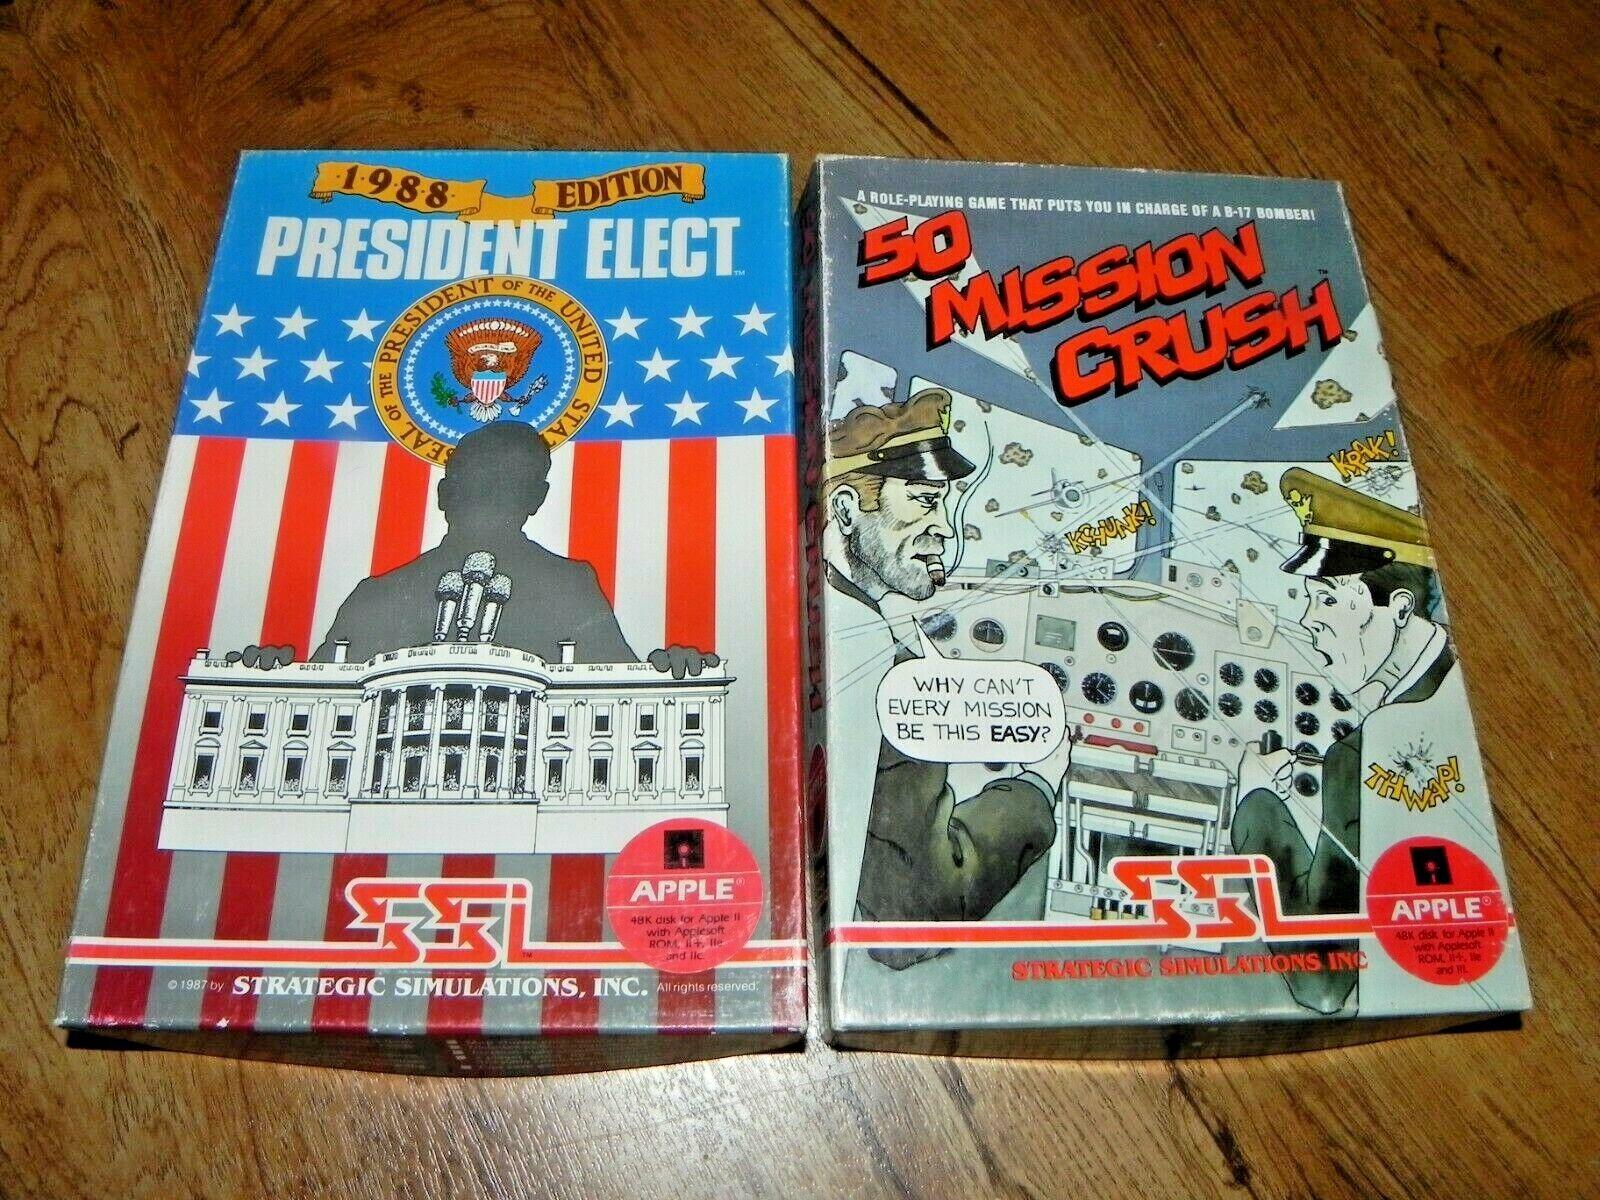 Computer Games - Lot 2 Vintage Apple SSI Computer Games - President Elect / 50 Mission Crunch